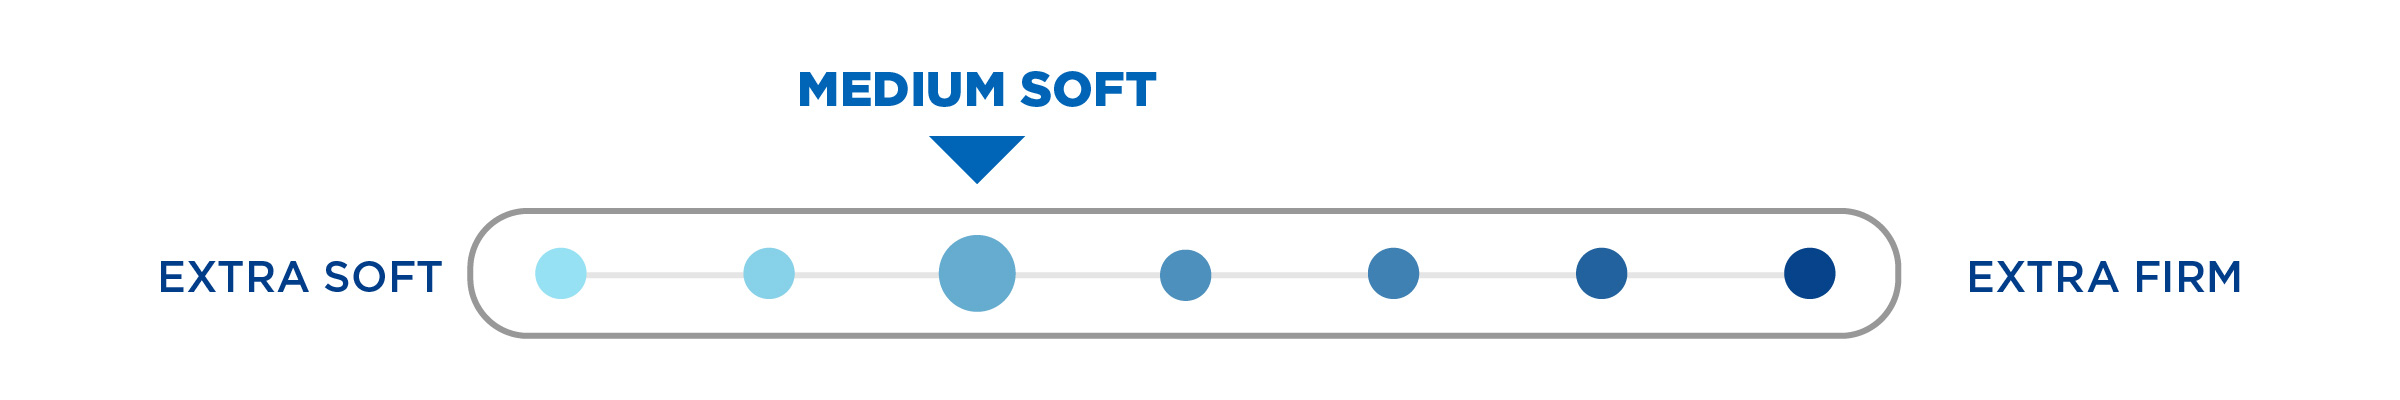 medium soft mattress comfort scale